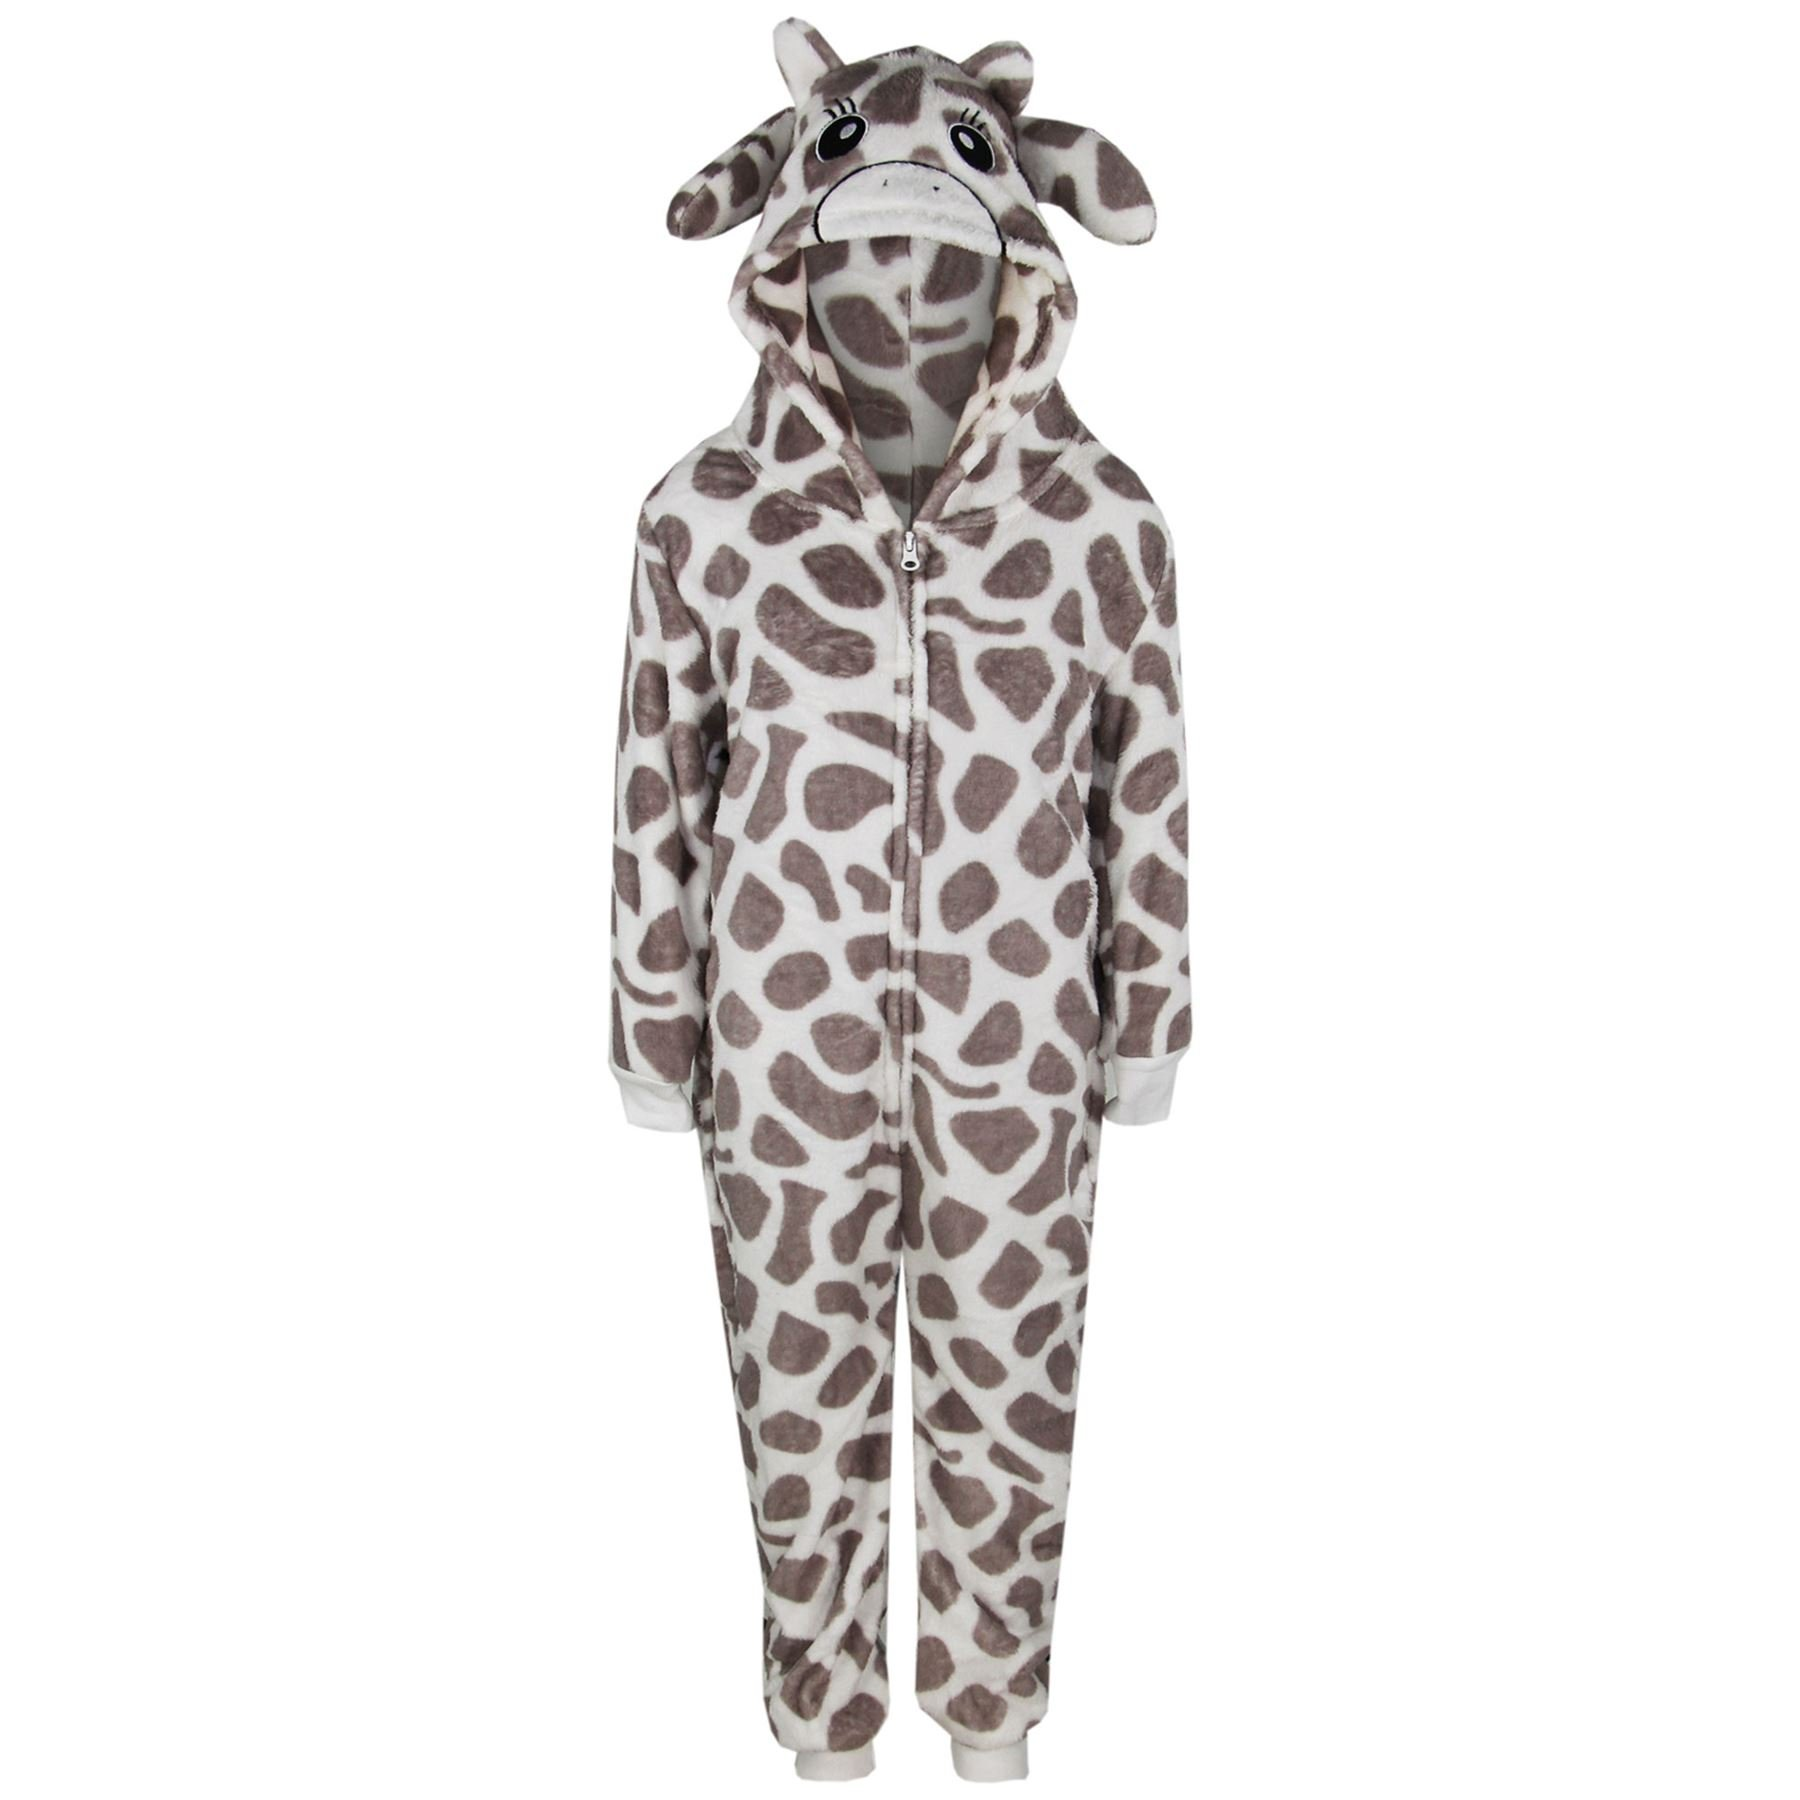 Girls//Boys Childrens Fleece All In One Hood//Kids Pyjamas Costume Age 2-13 Years